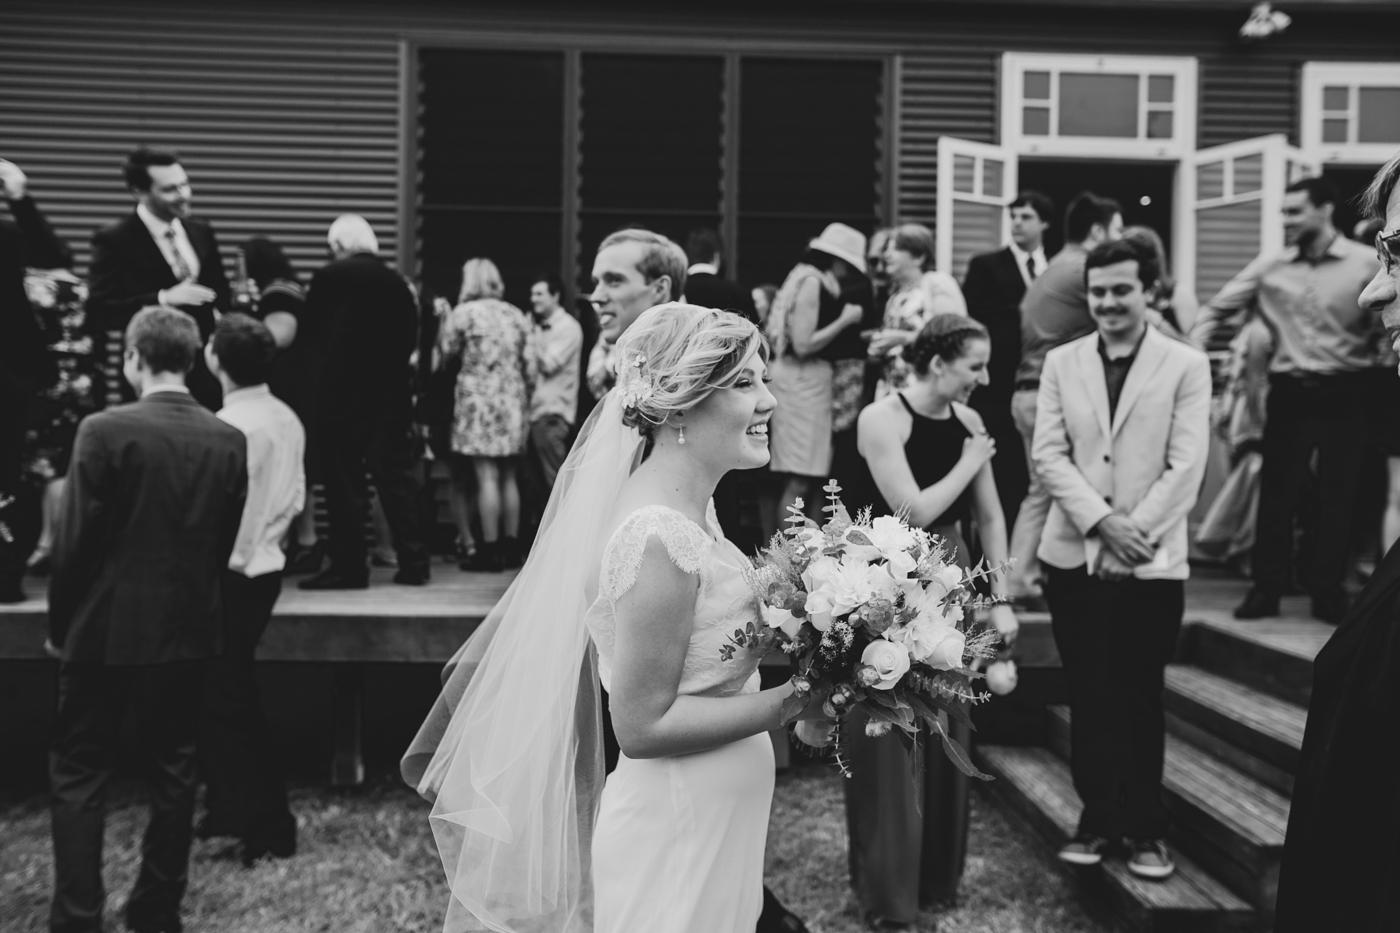 Rachel & Jacob - Willow Farm Berry - South Coast Wedding - Samantha Heather Photography-90.jpg